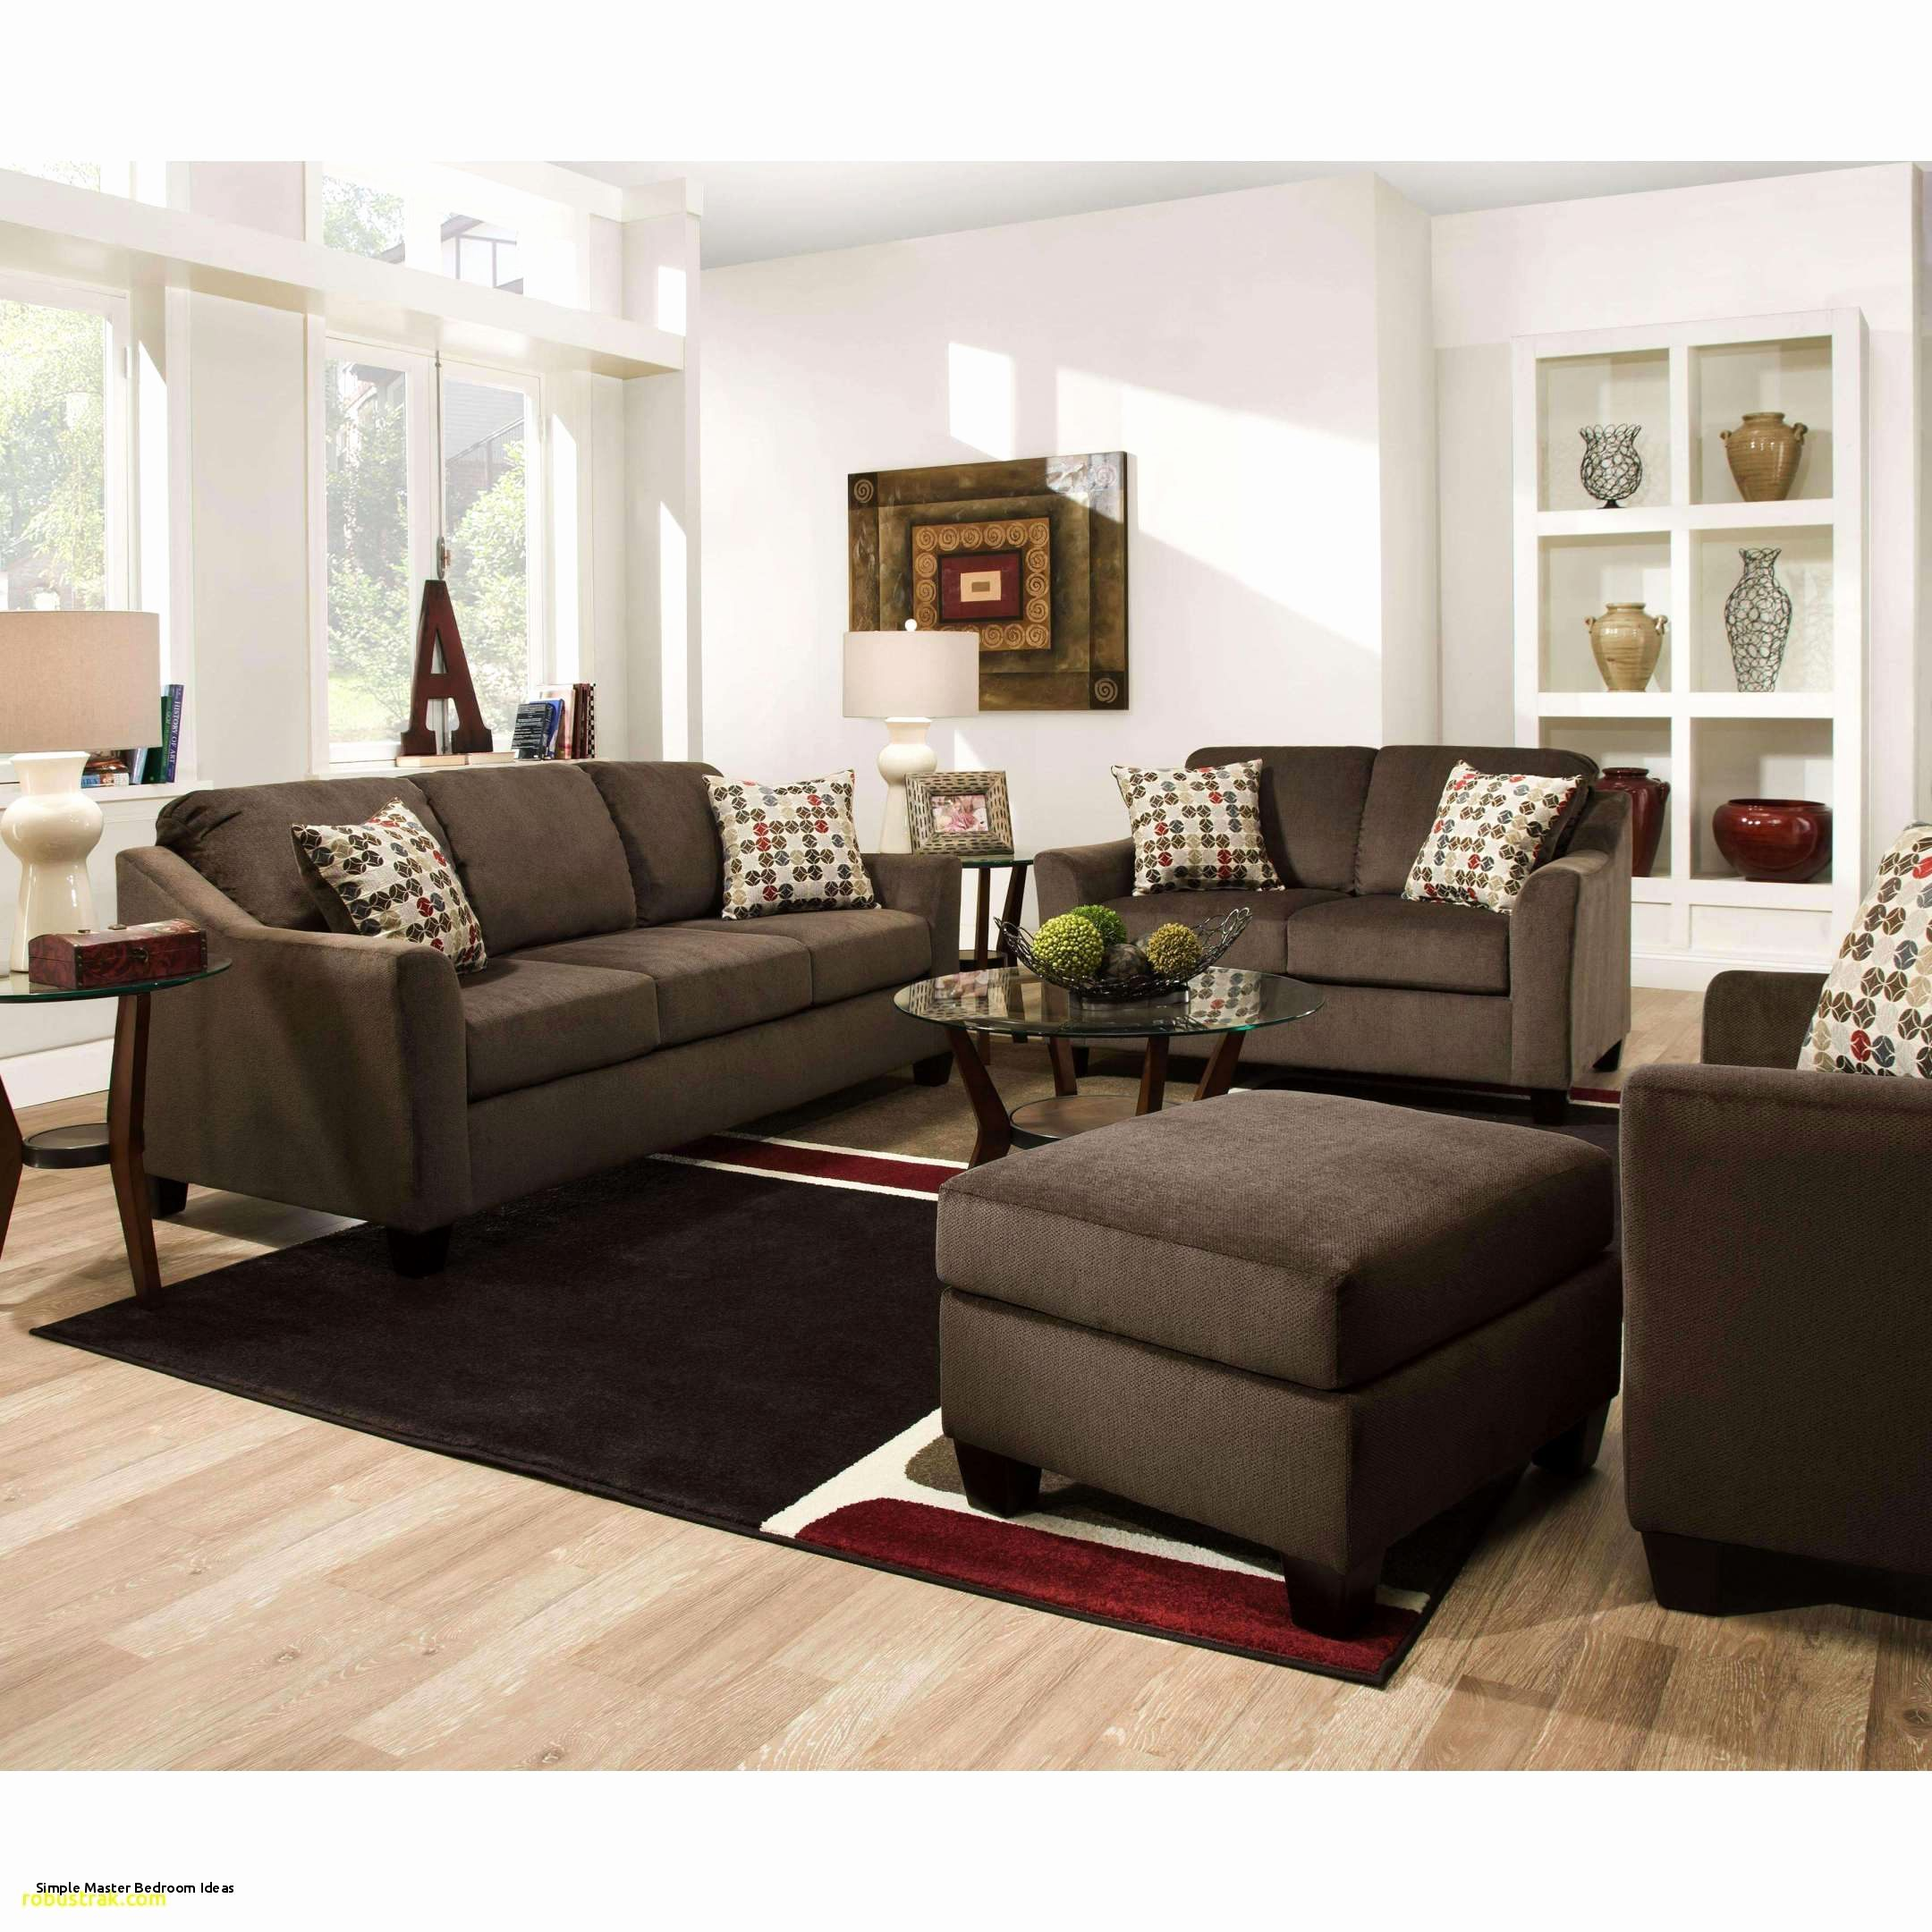 Tete De Lit Marron Génial 25 Best Master Bedroom Interior Design